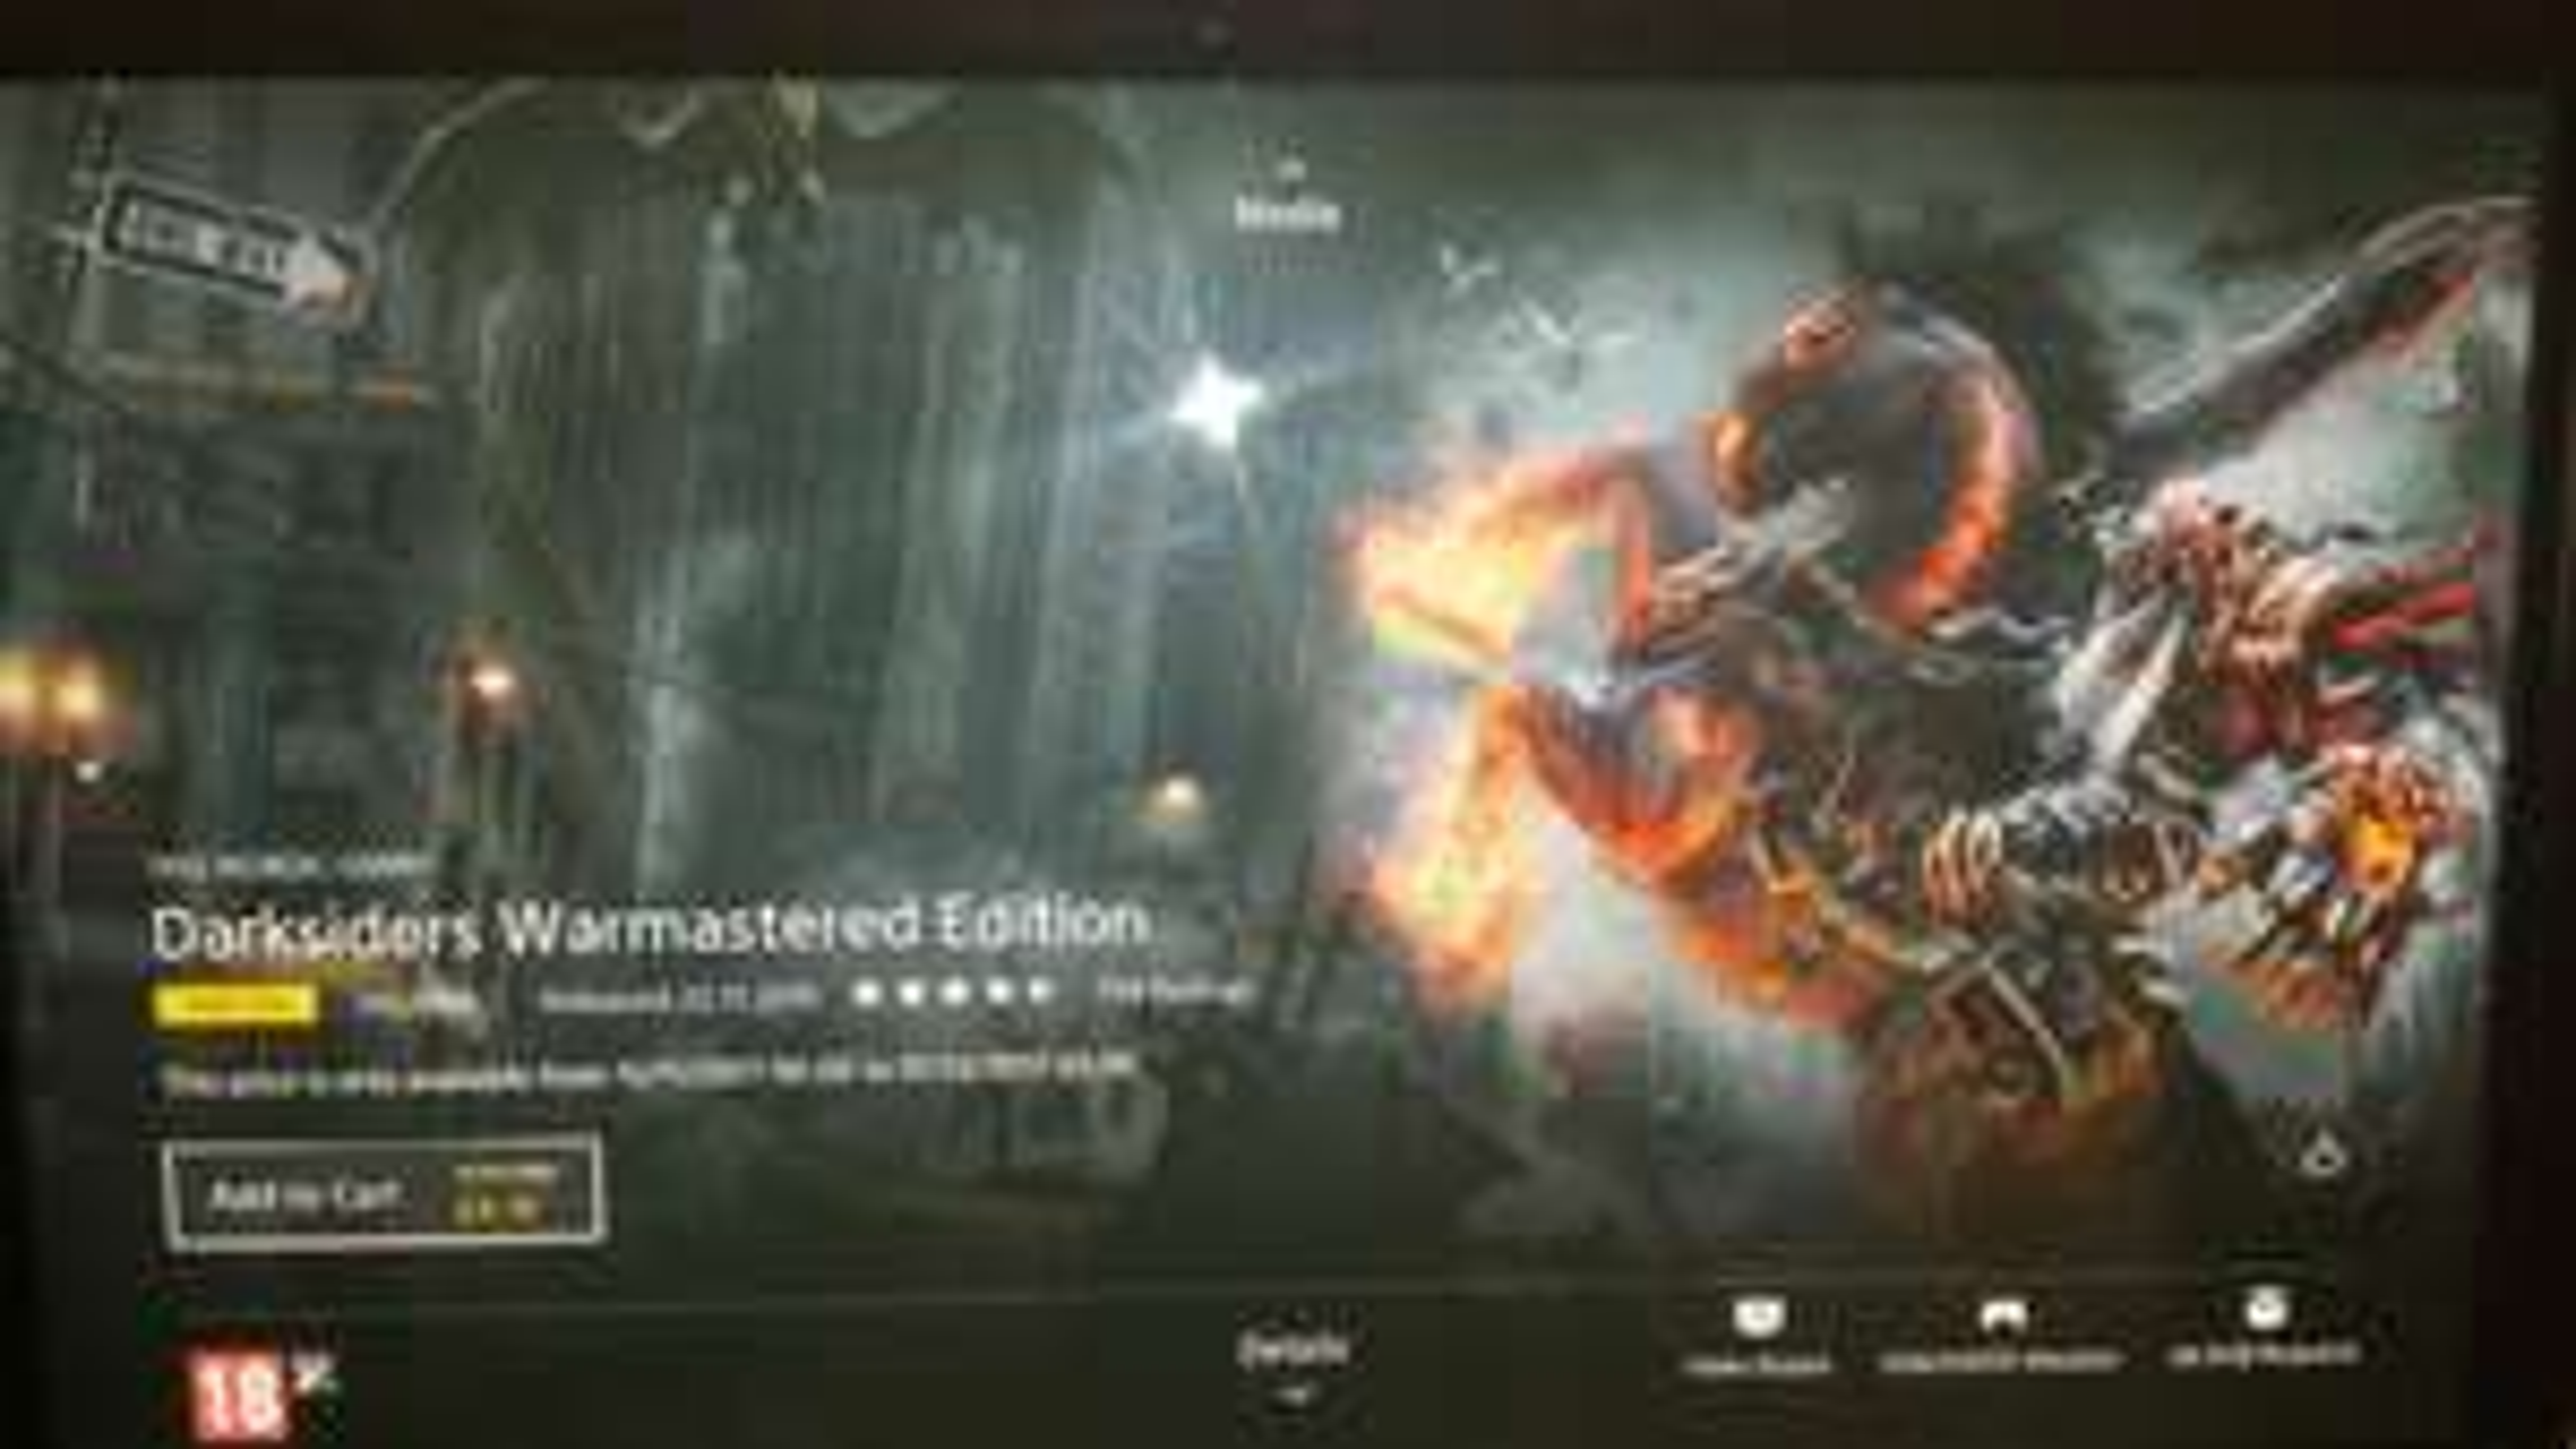 Darksiders Warmastered Edition PS4 - £4.79 @ PSN